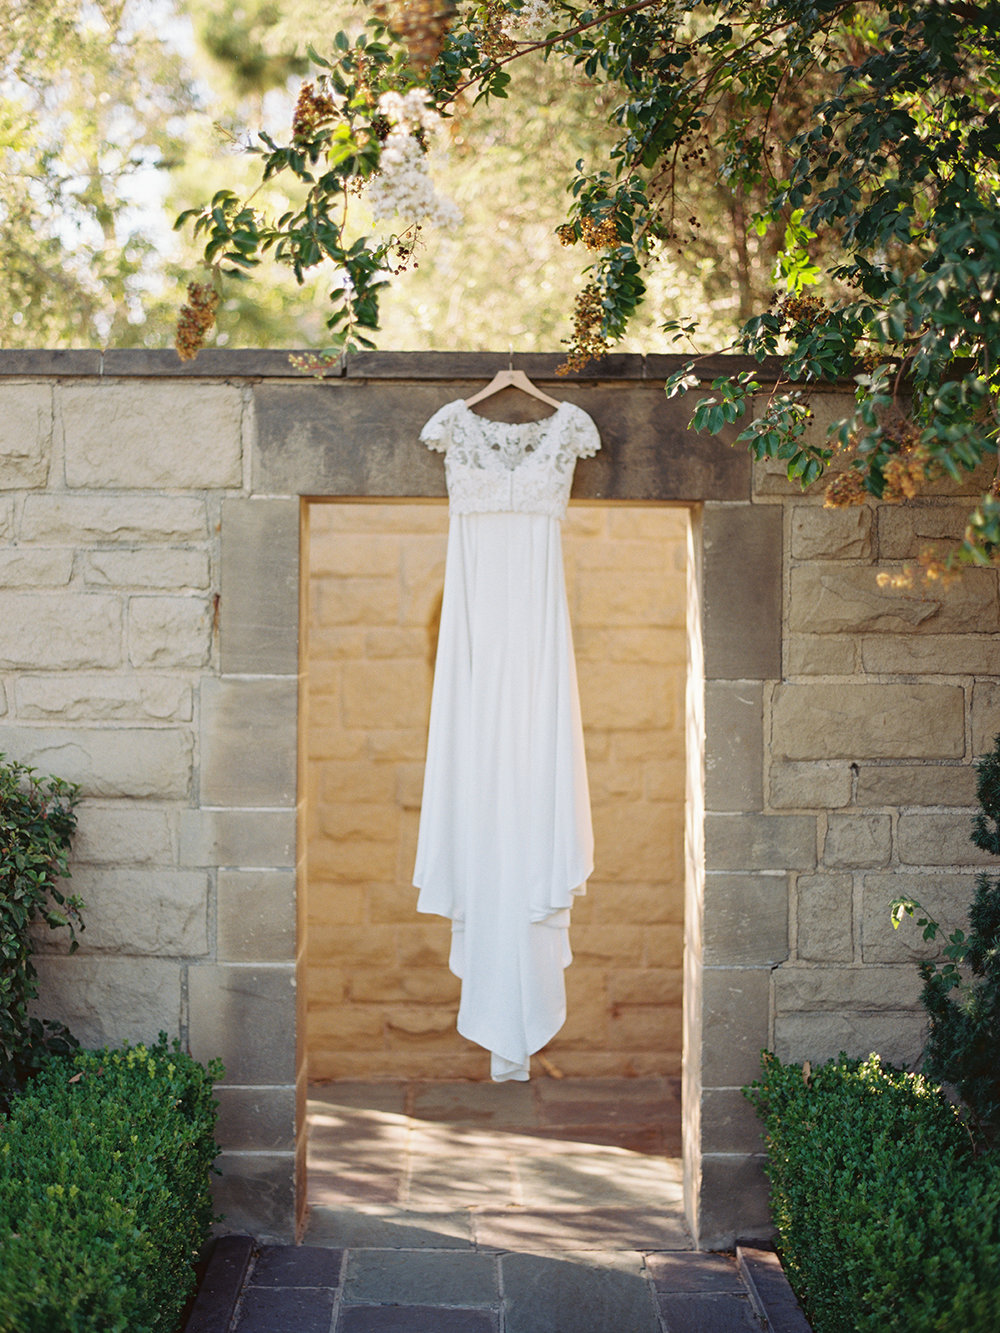 037-brian-sarra-los-angeles-wedding-brumley-wells-photography.jpg